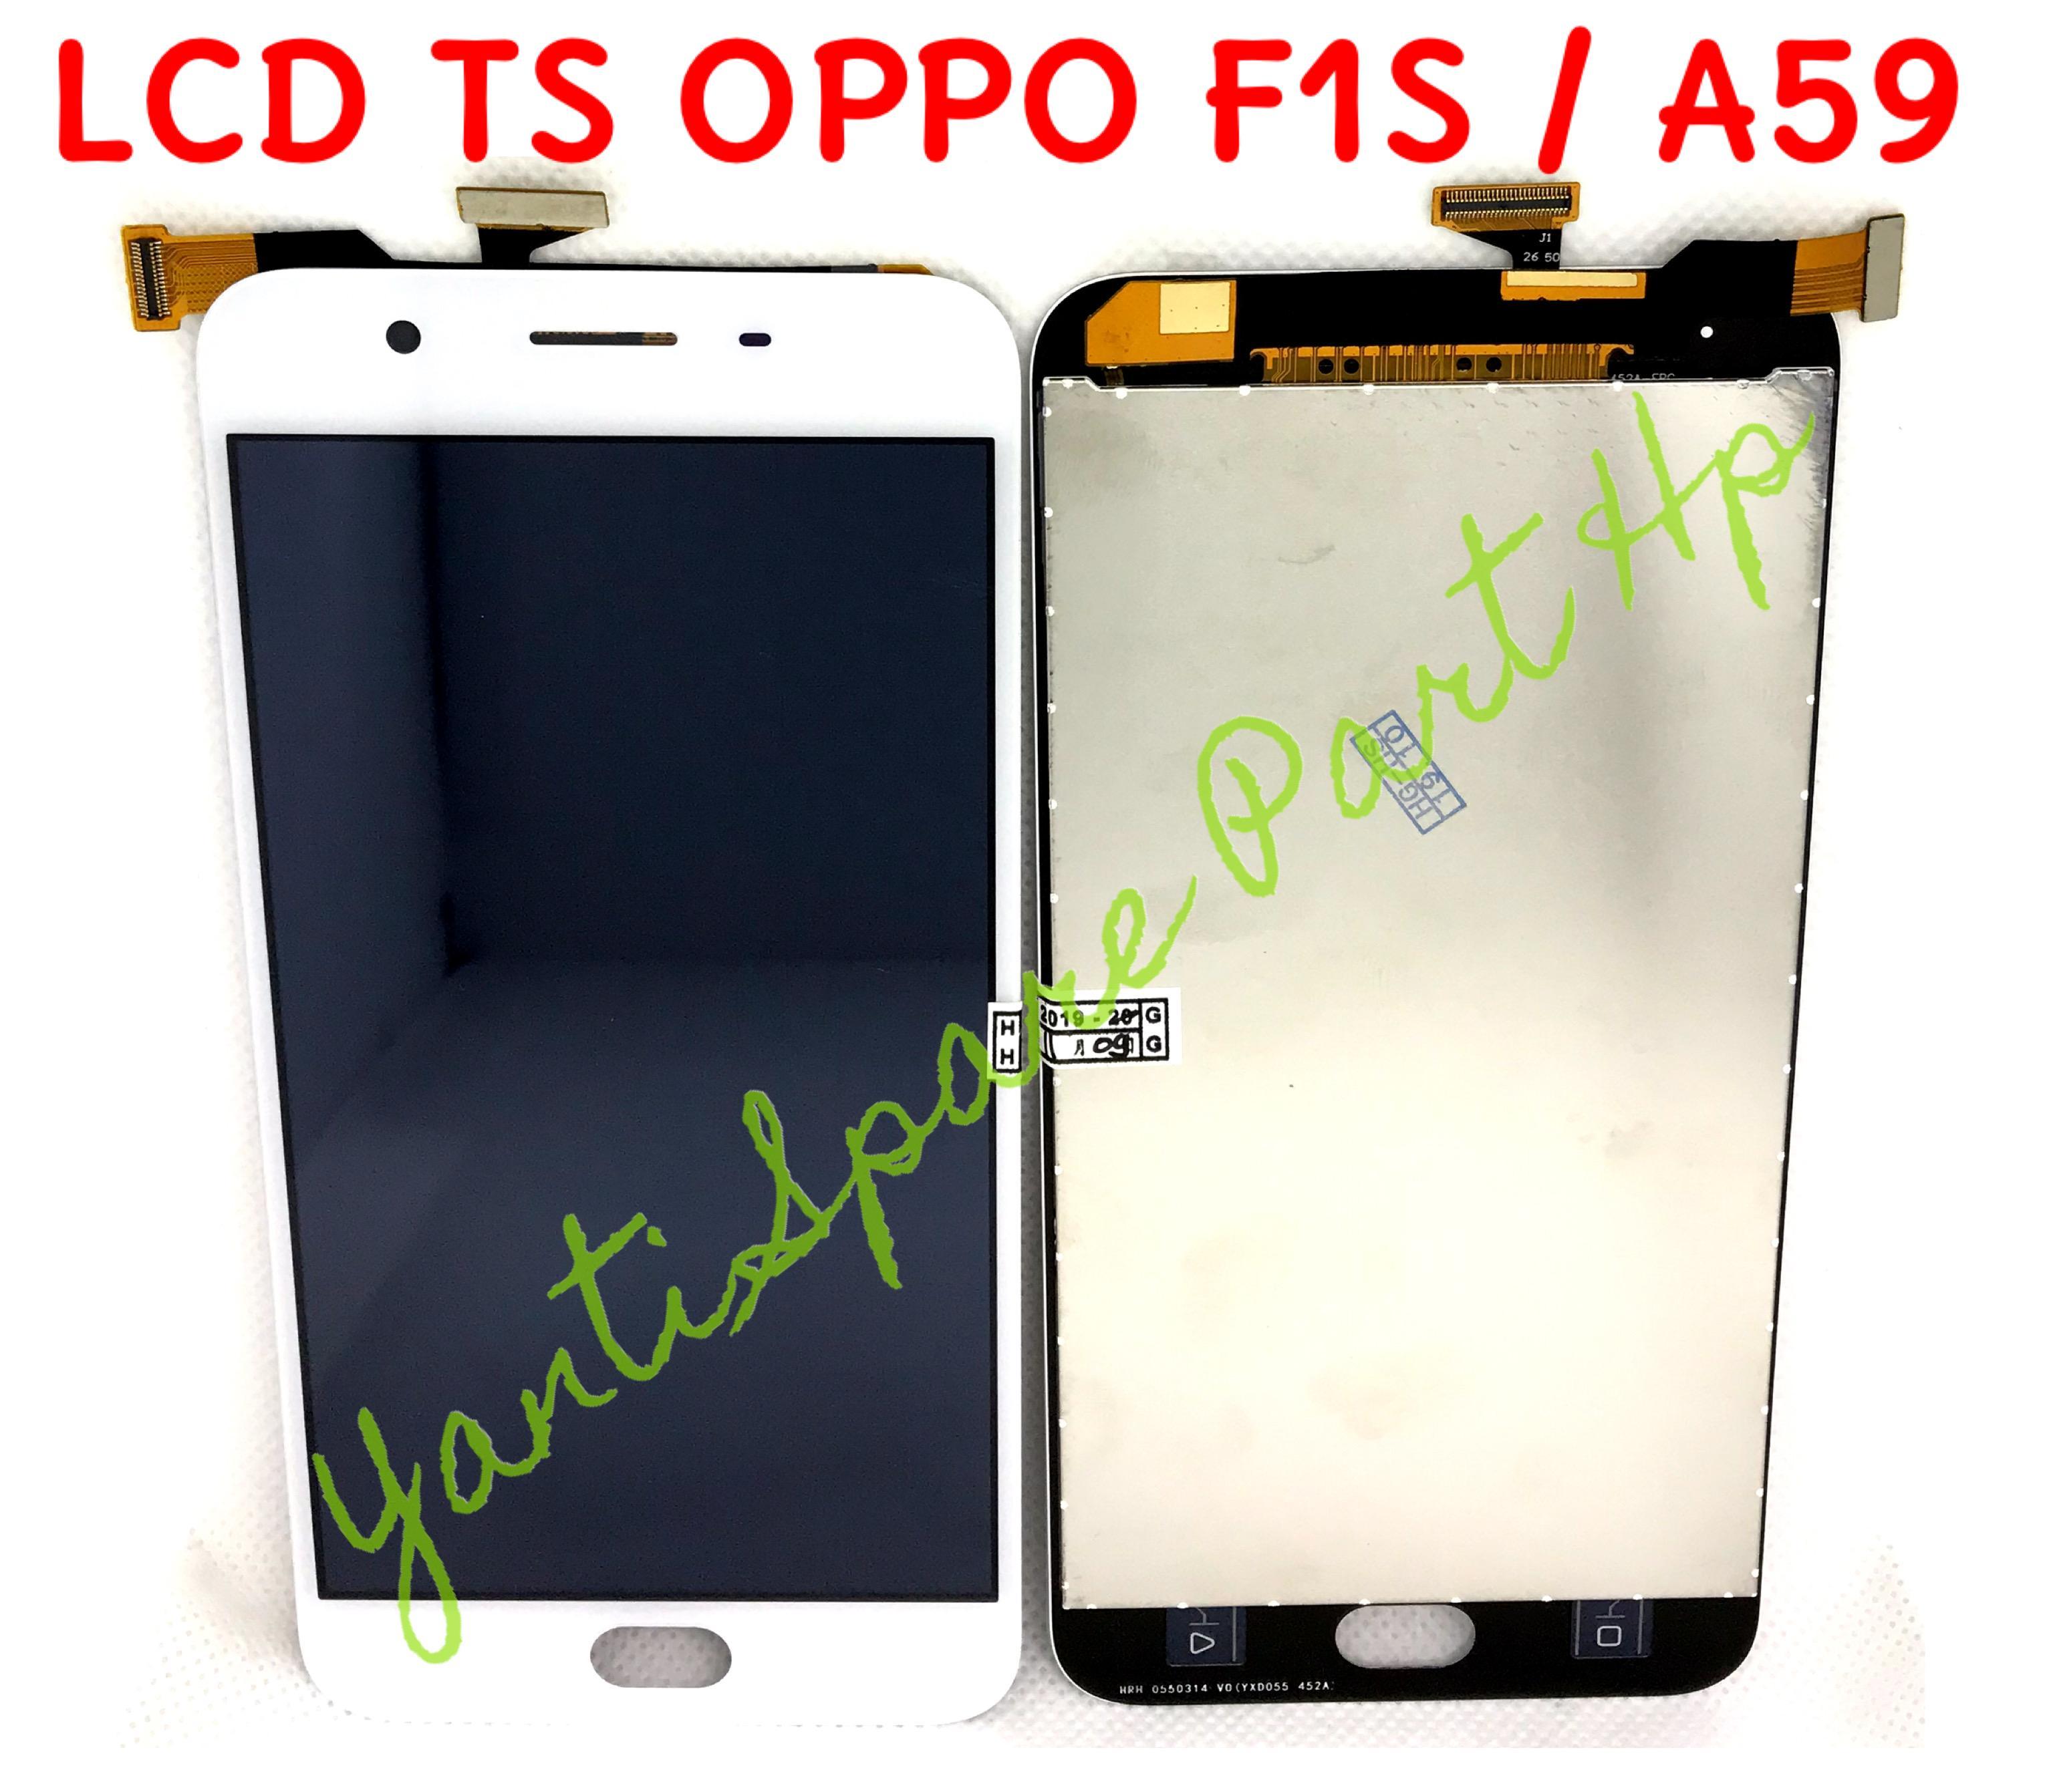 Produk OPPO Original Terbaru | Lazada.co.id